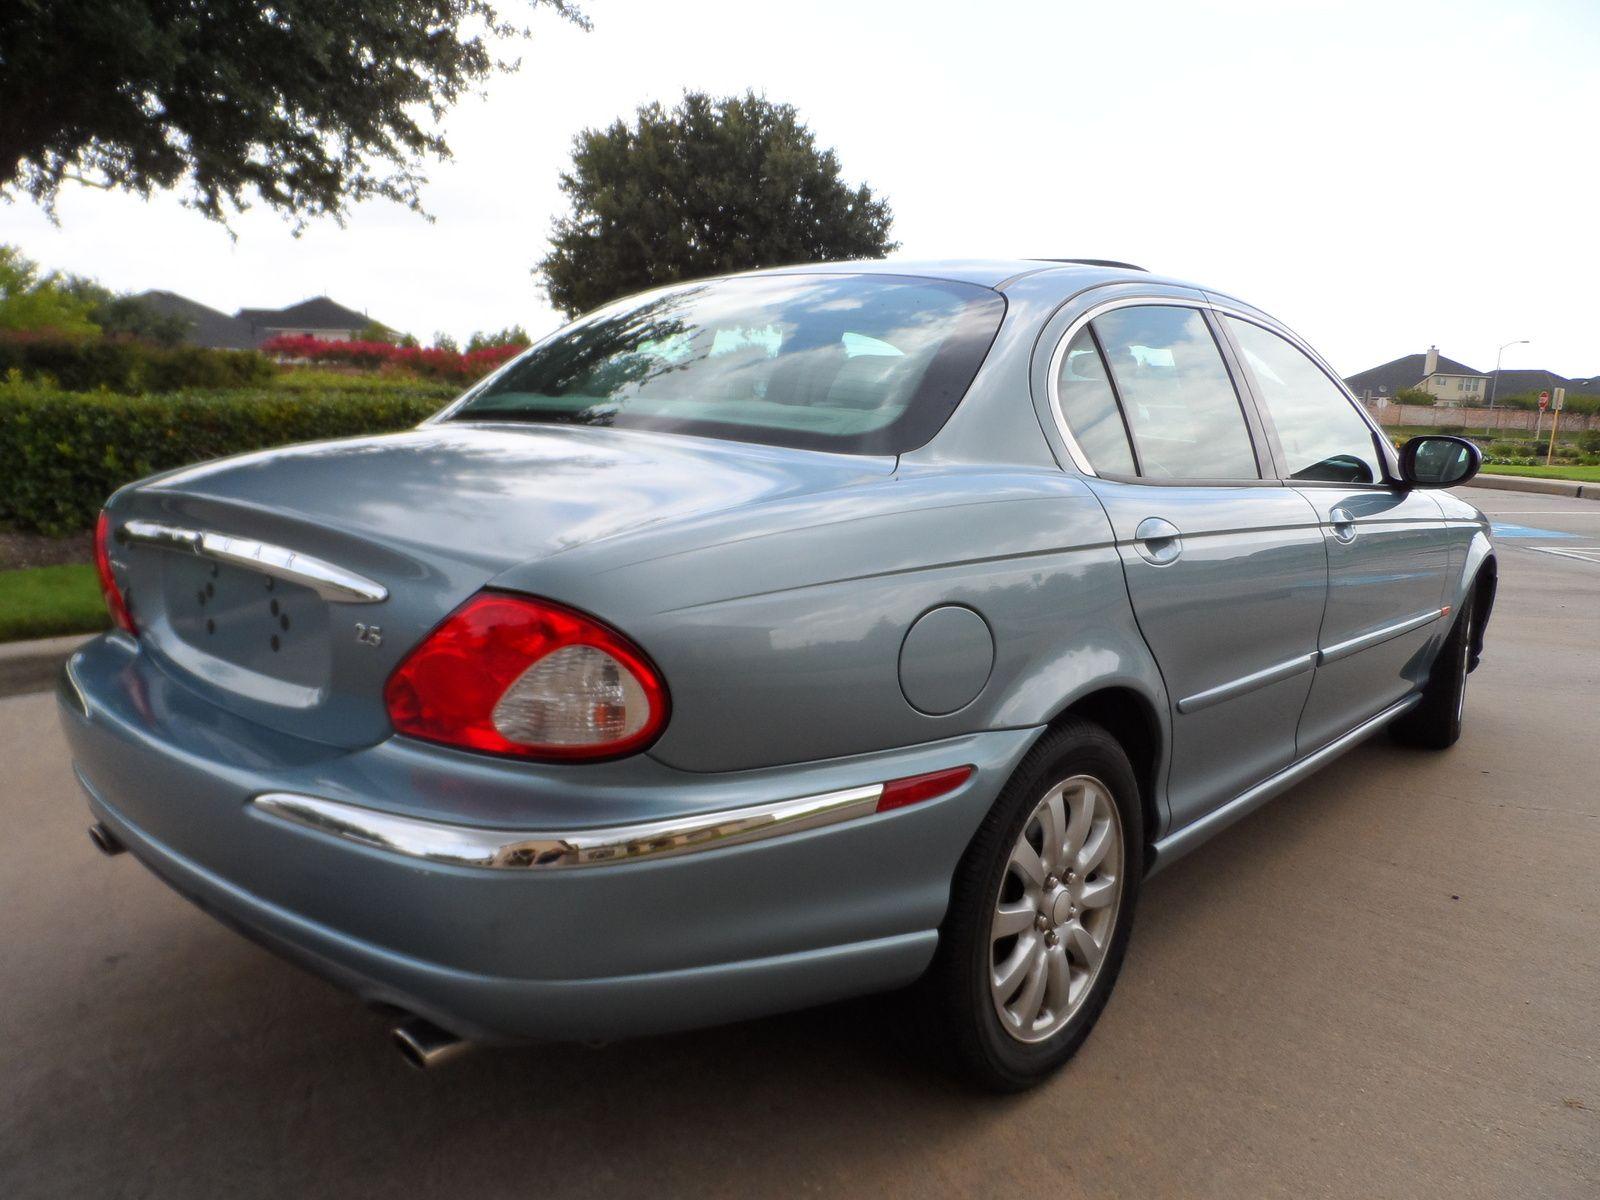 2004 Jaguar X-Type Wagon 3.0 Specs, Colors, 0-60, 0-100, Quarter Mile Drag and Top Speed Review ...